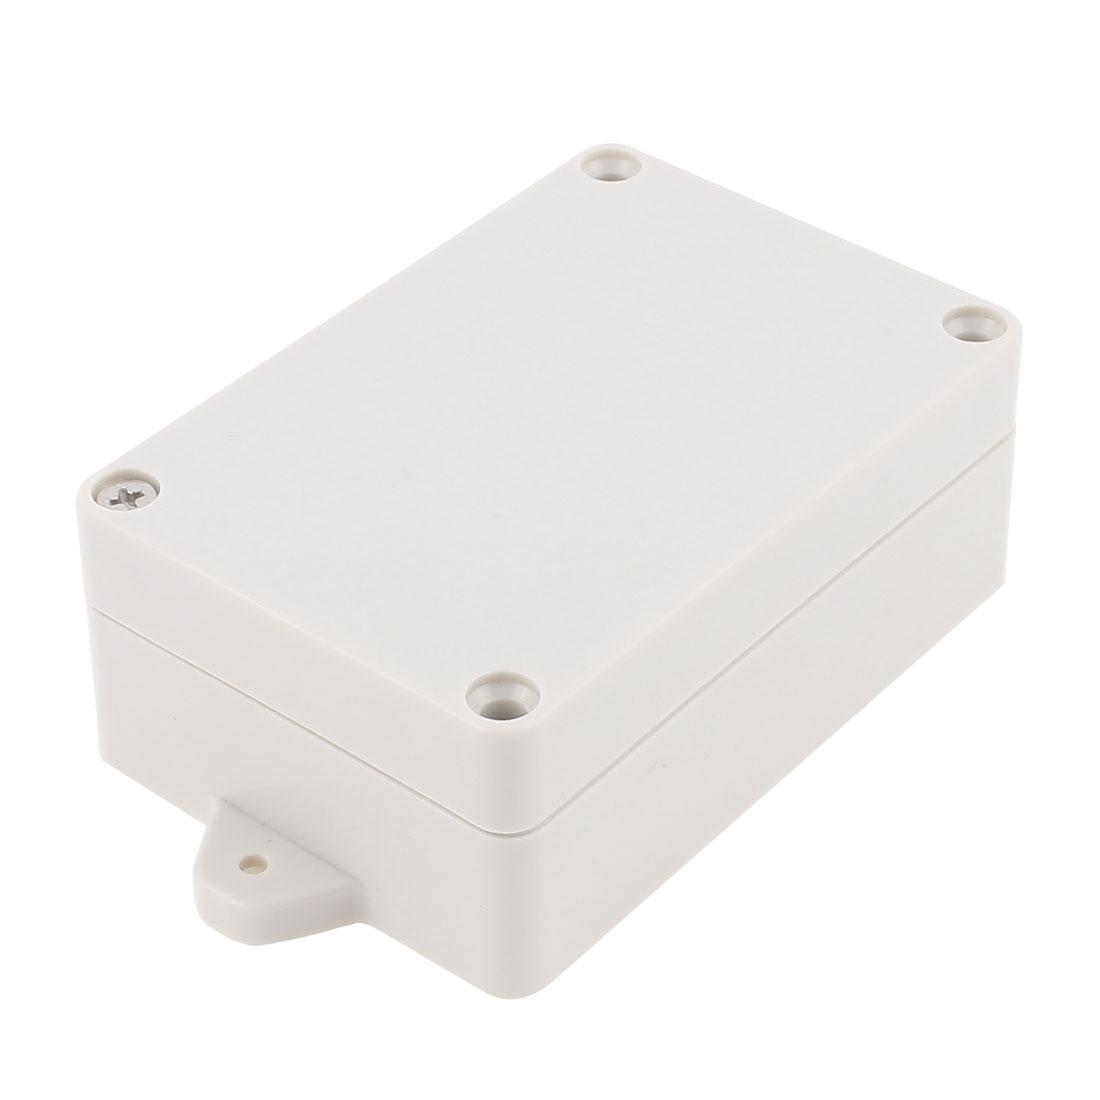 124mm x 68mm x 40mm Dustproof IP65 Junction Box Terminal Connect Enclosure